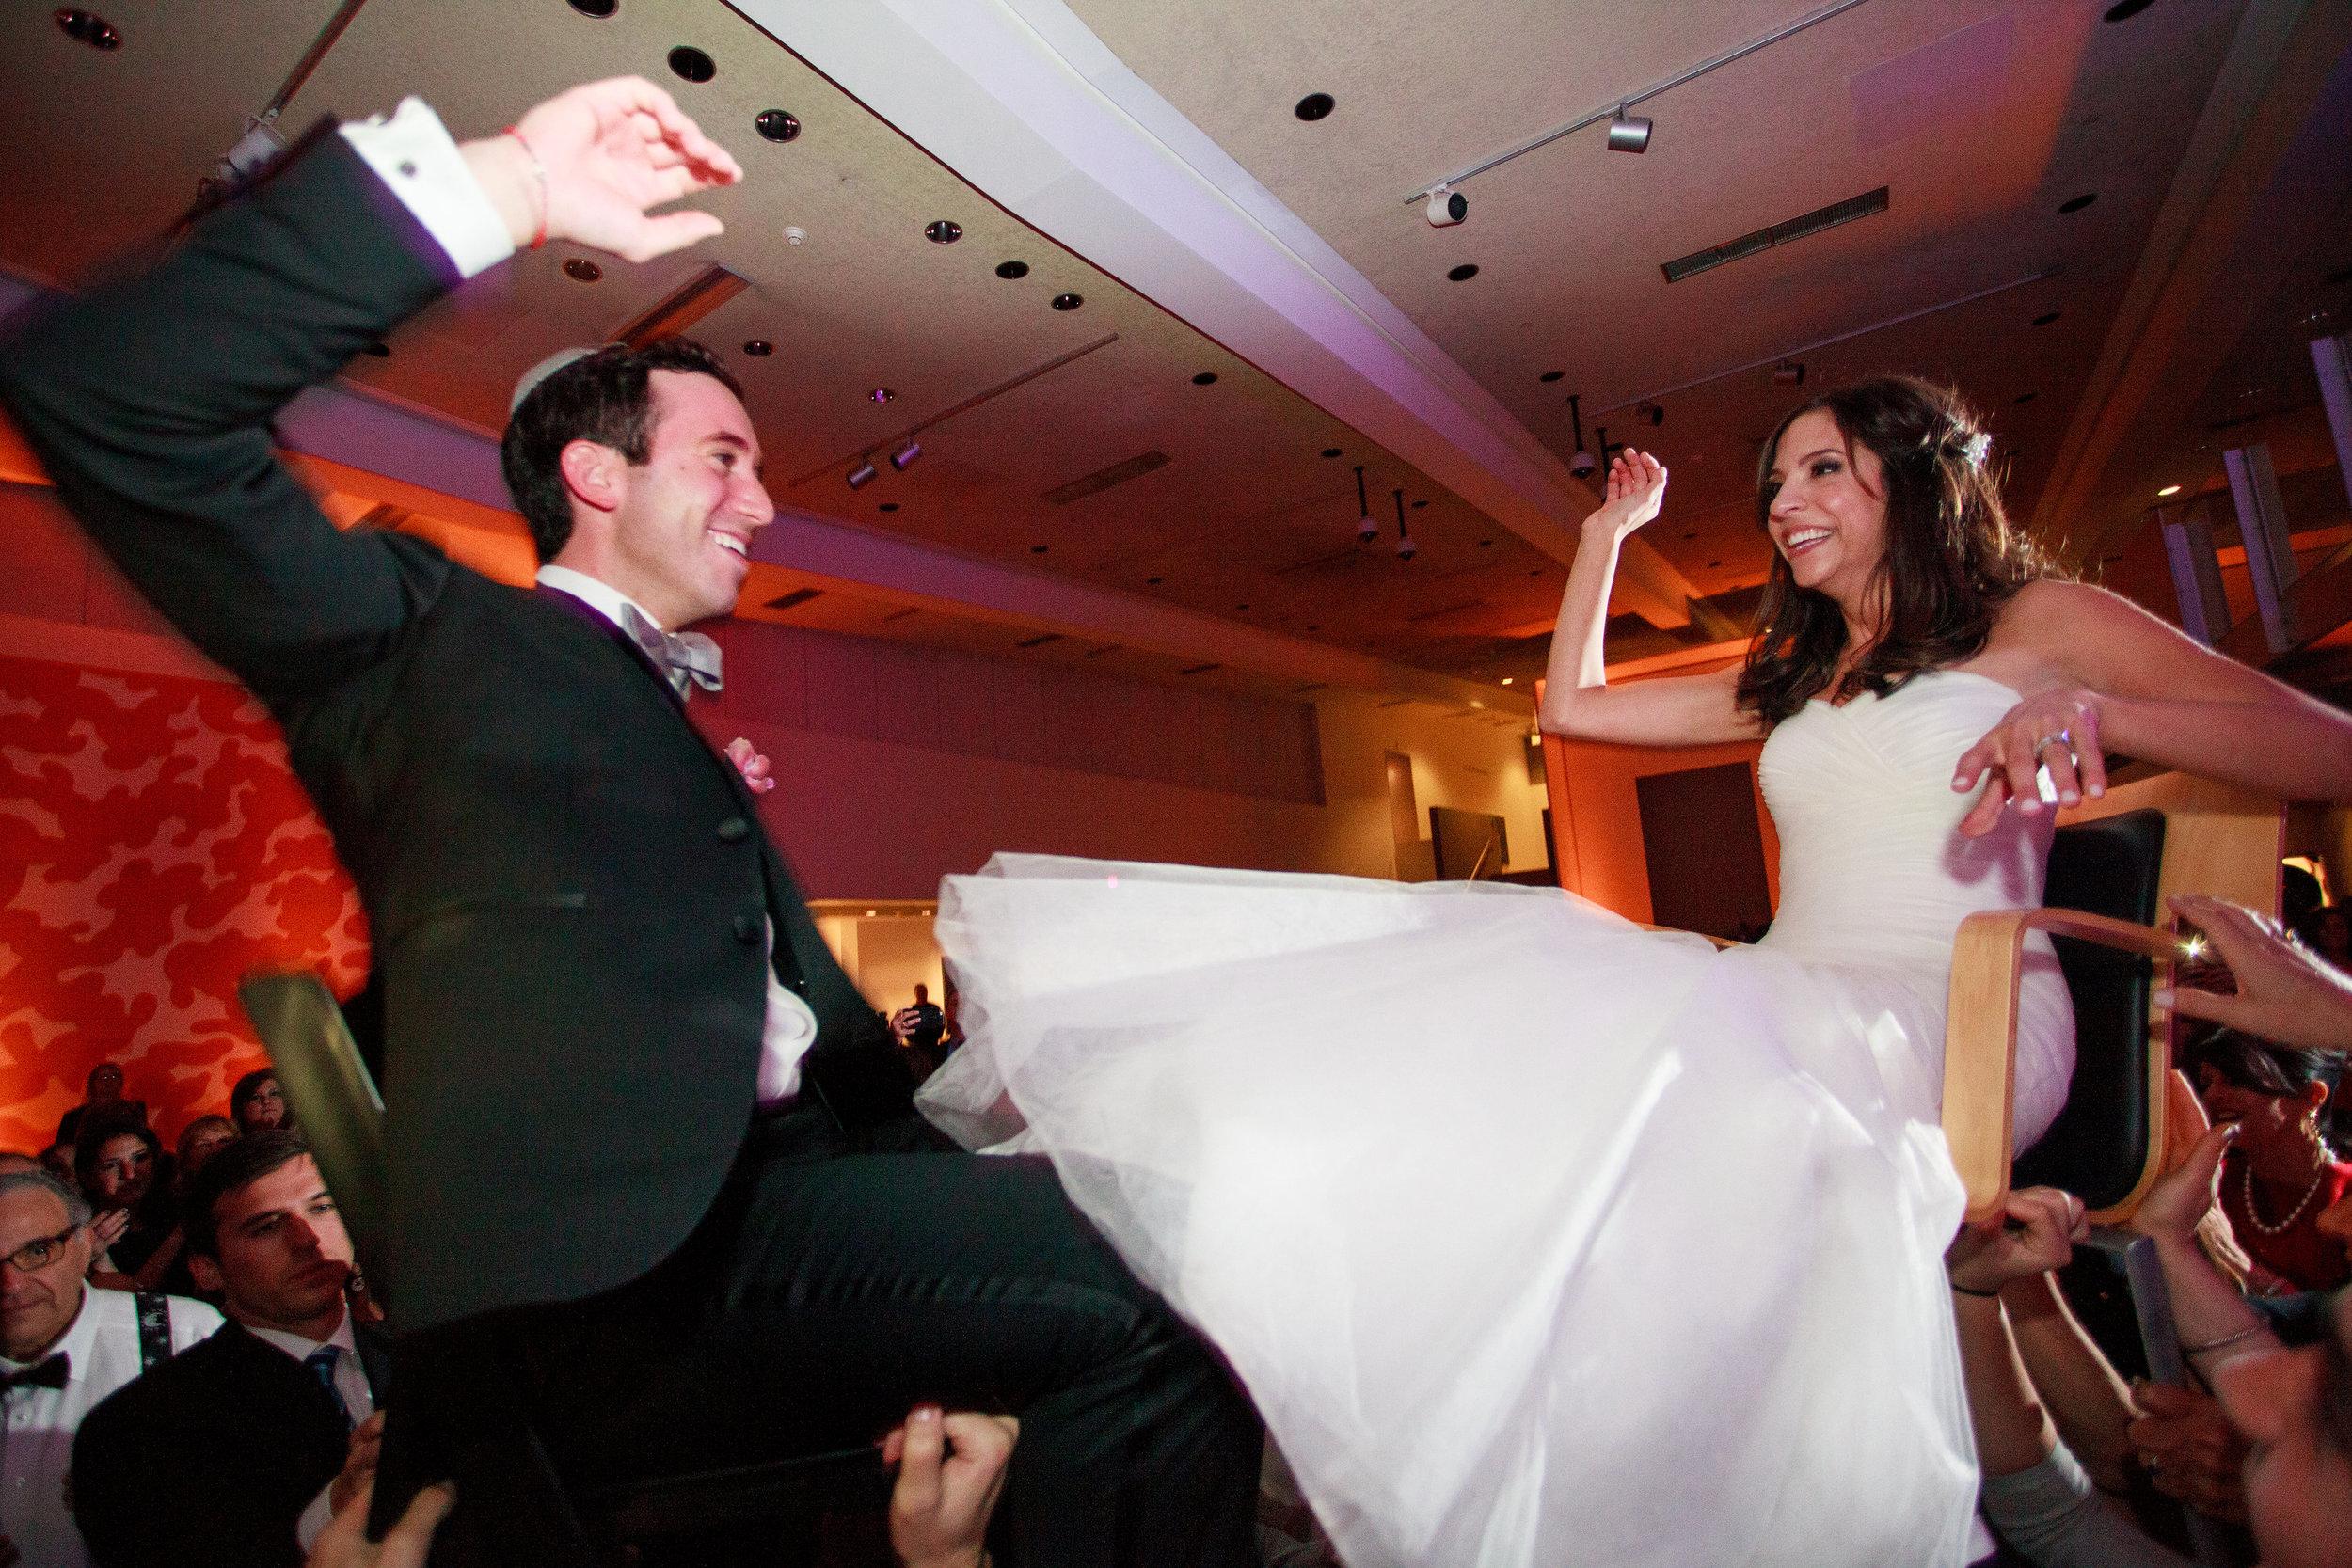 wedding, Arizona wedding, art museum wedding, wedding planner, wedding lighting, Phoenix-Scottsdale-Arizona-Wedding-Planner-Wedding-Venue-Destination-Wedding-Planner, horah, jewish wedding